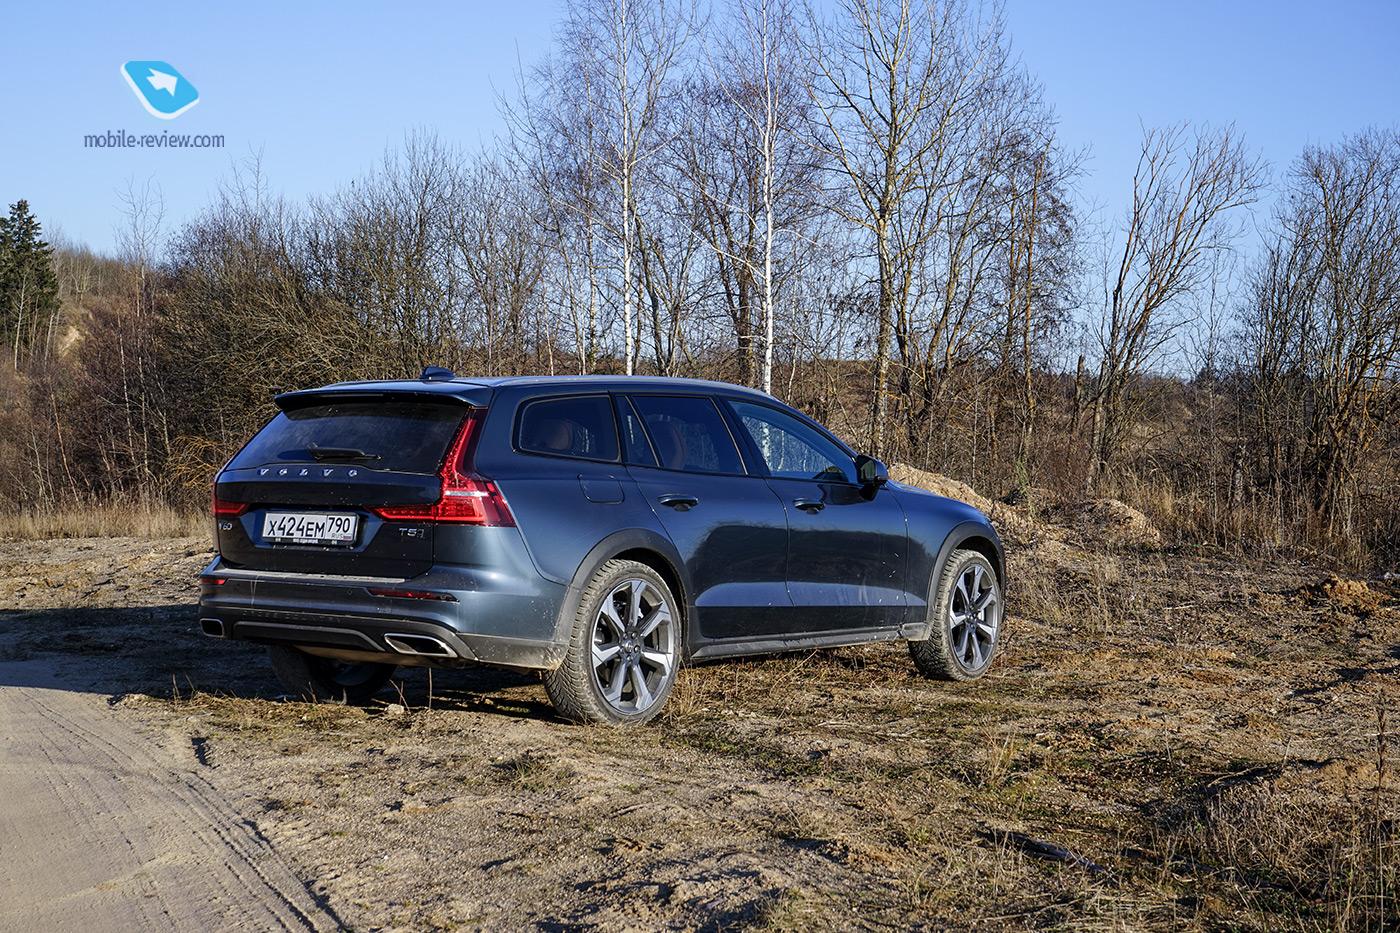 Тест Volvo V60 Cross Country. Практичный универсал